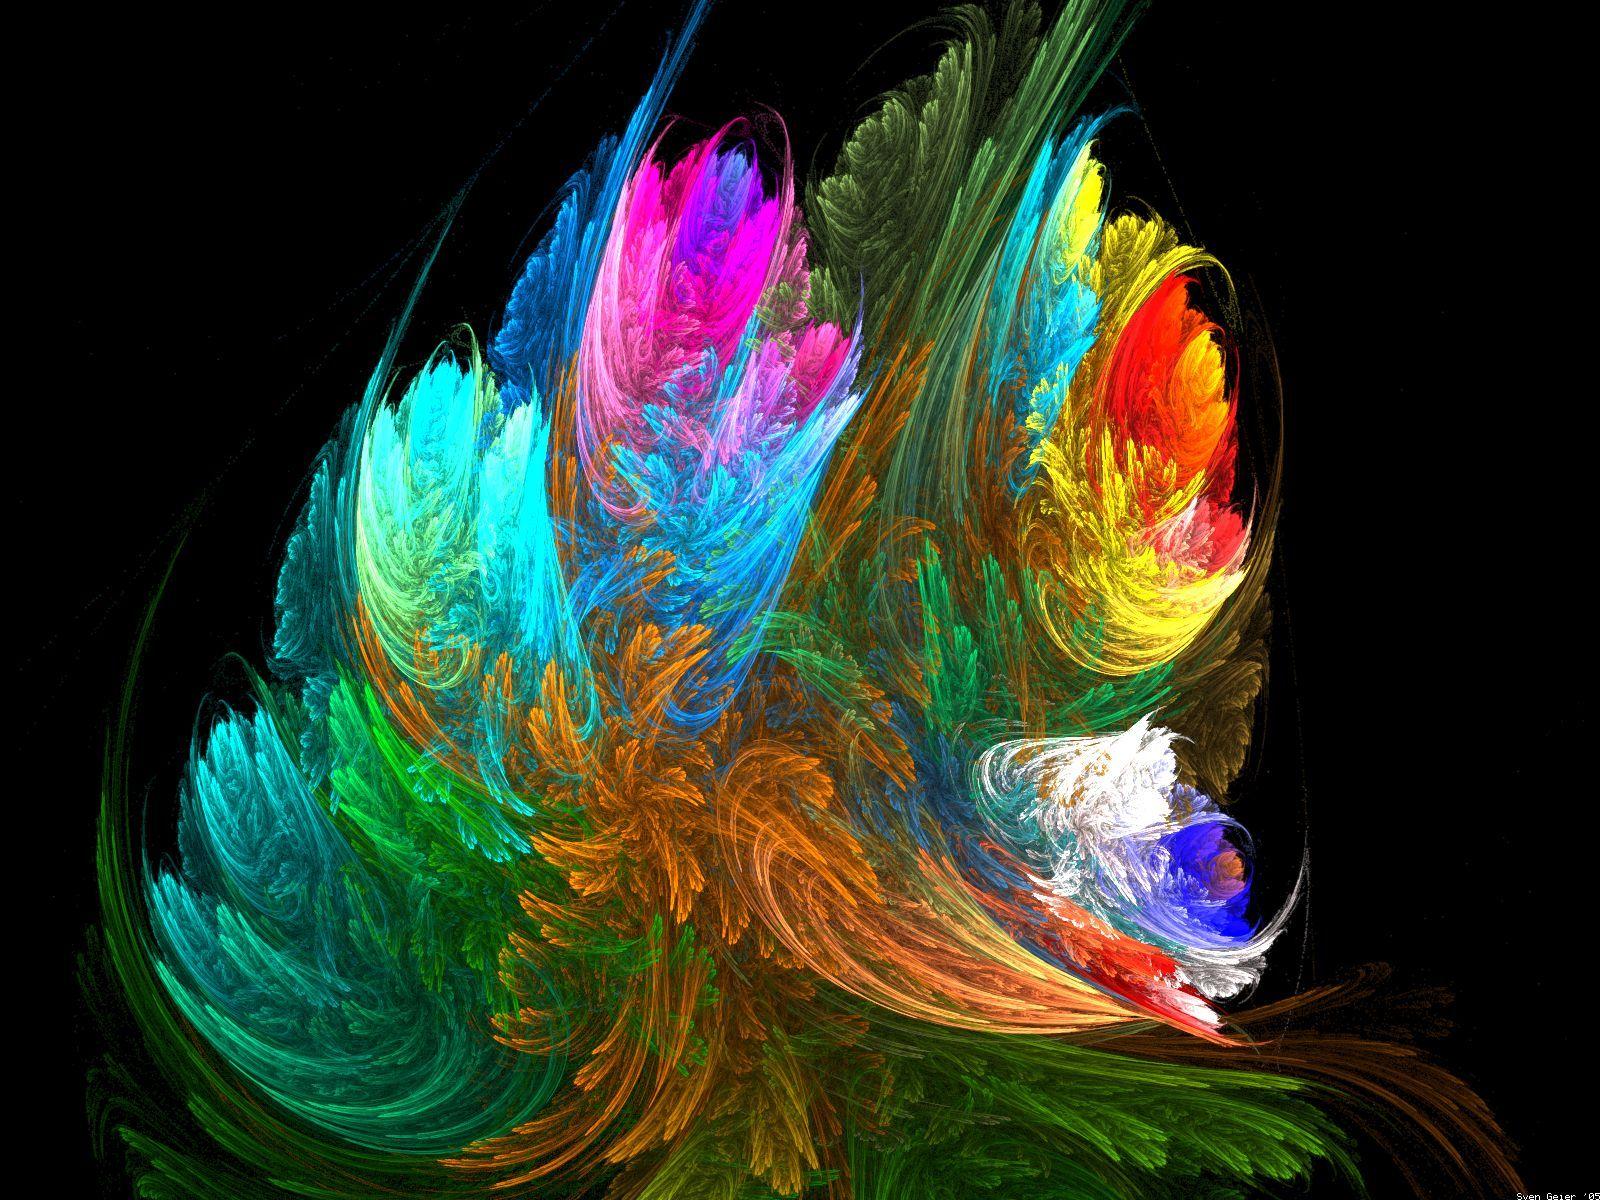 download Amazing 3D Desktop Backgrounds Wallpapers Mobile 1600x1200